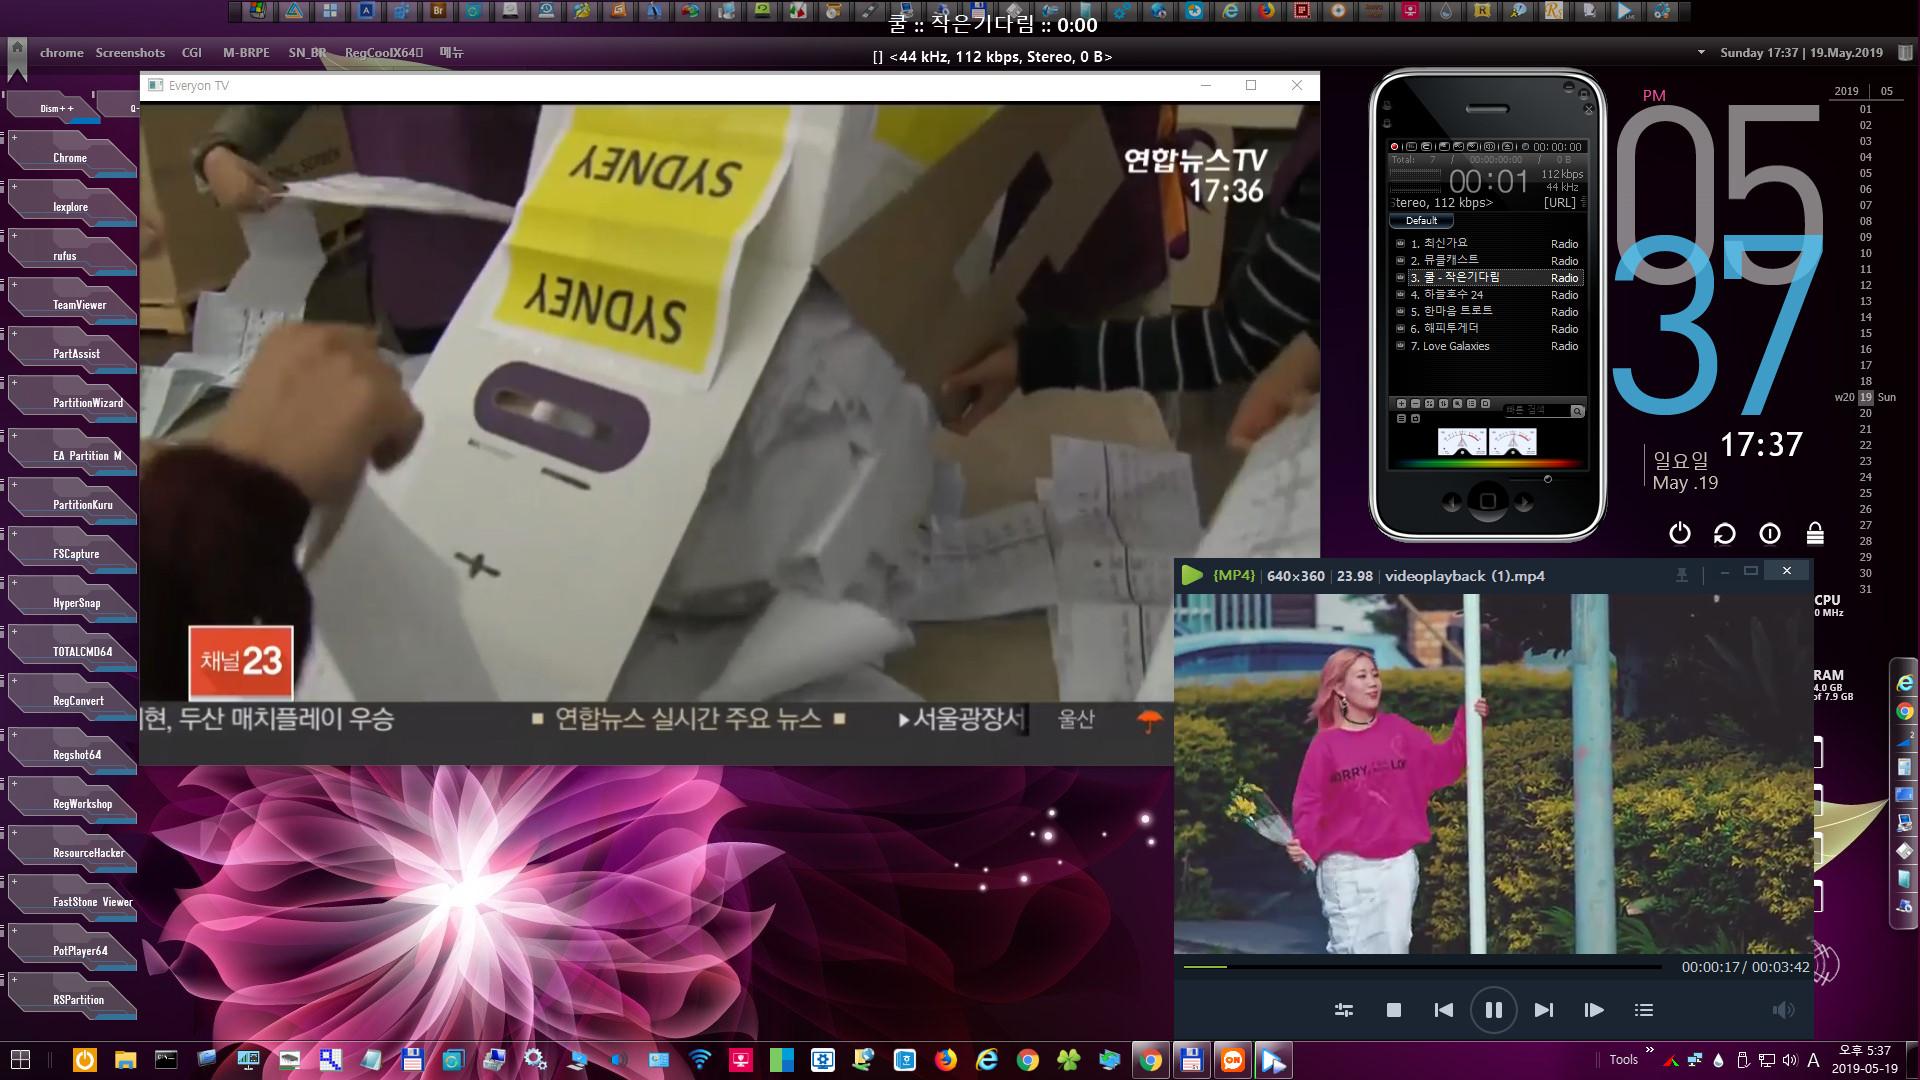 Win10XPE_x64_Chum_190518_0013-01.jpg